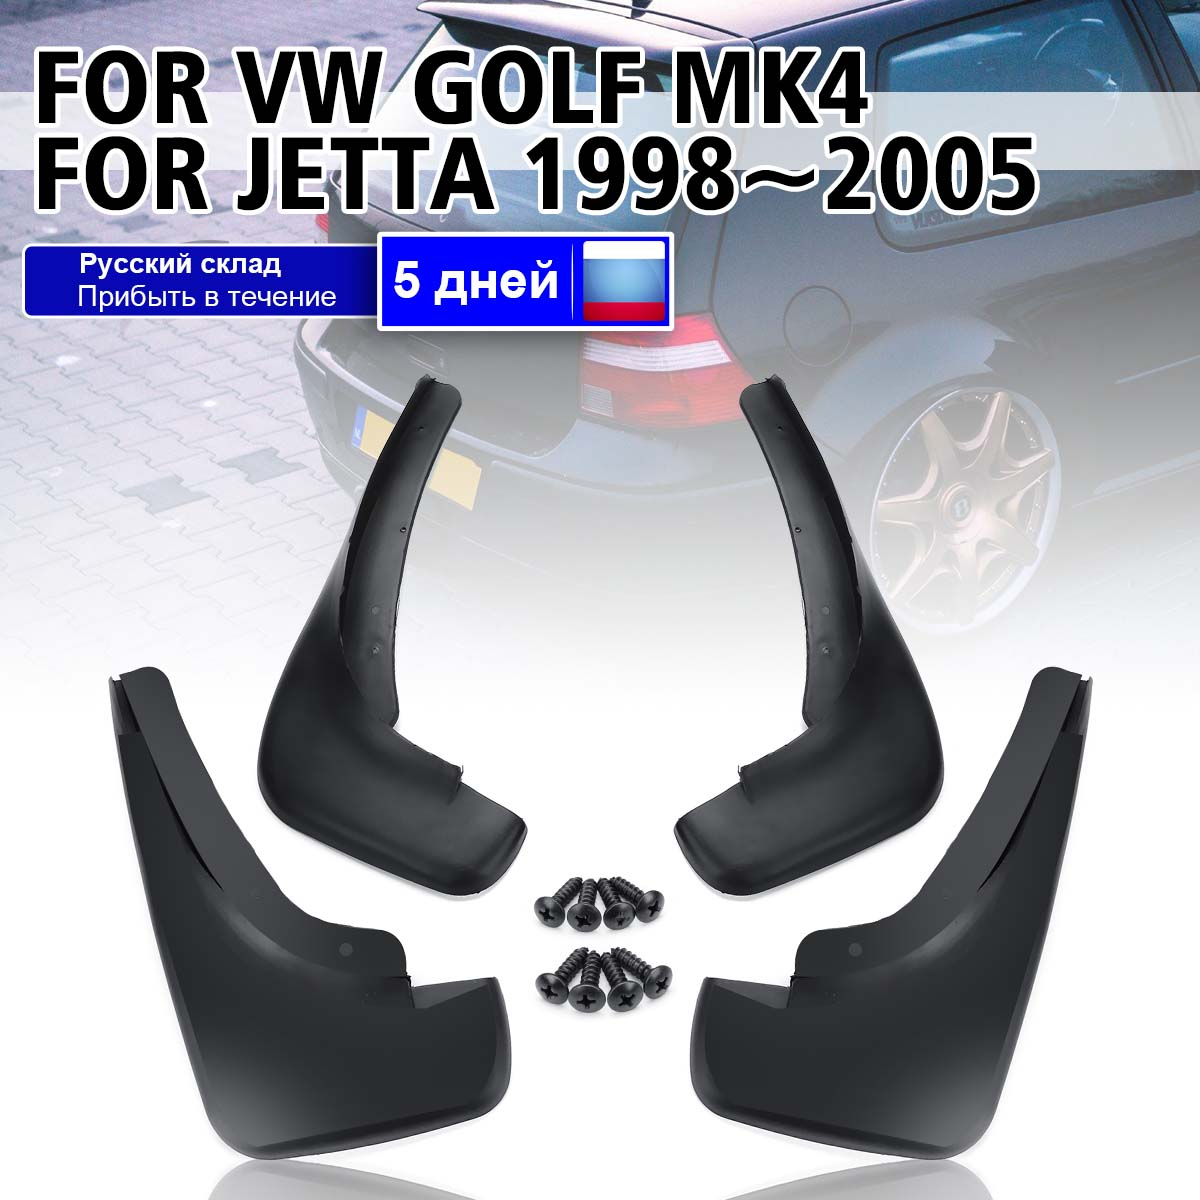 Aletas da lama do carro para vw golf 4 mk4 iv bora jetta 1998-2005 mudflaps respingo guardas dianteiro traseiro para-lamas